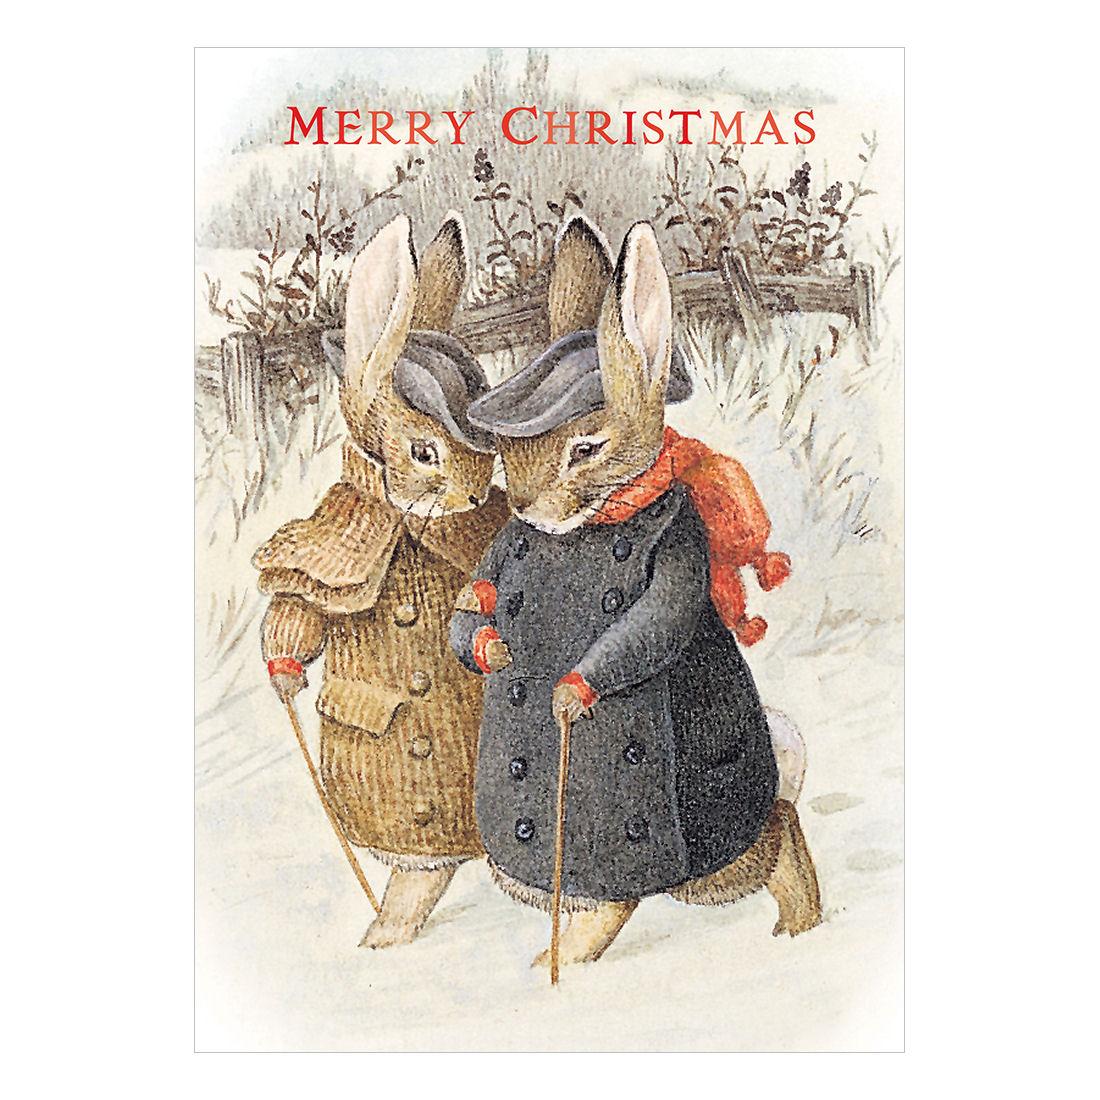 MR Amp MRS RABBIT CHRISTMAS CARD RETRO VINTAGE BLANK